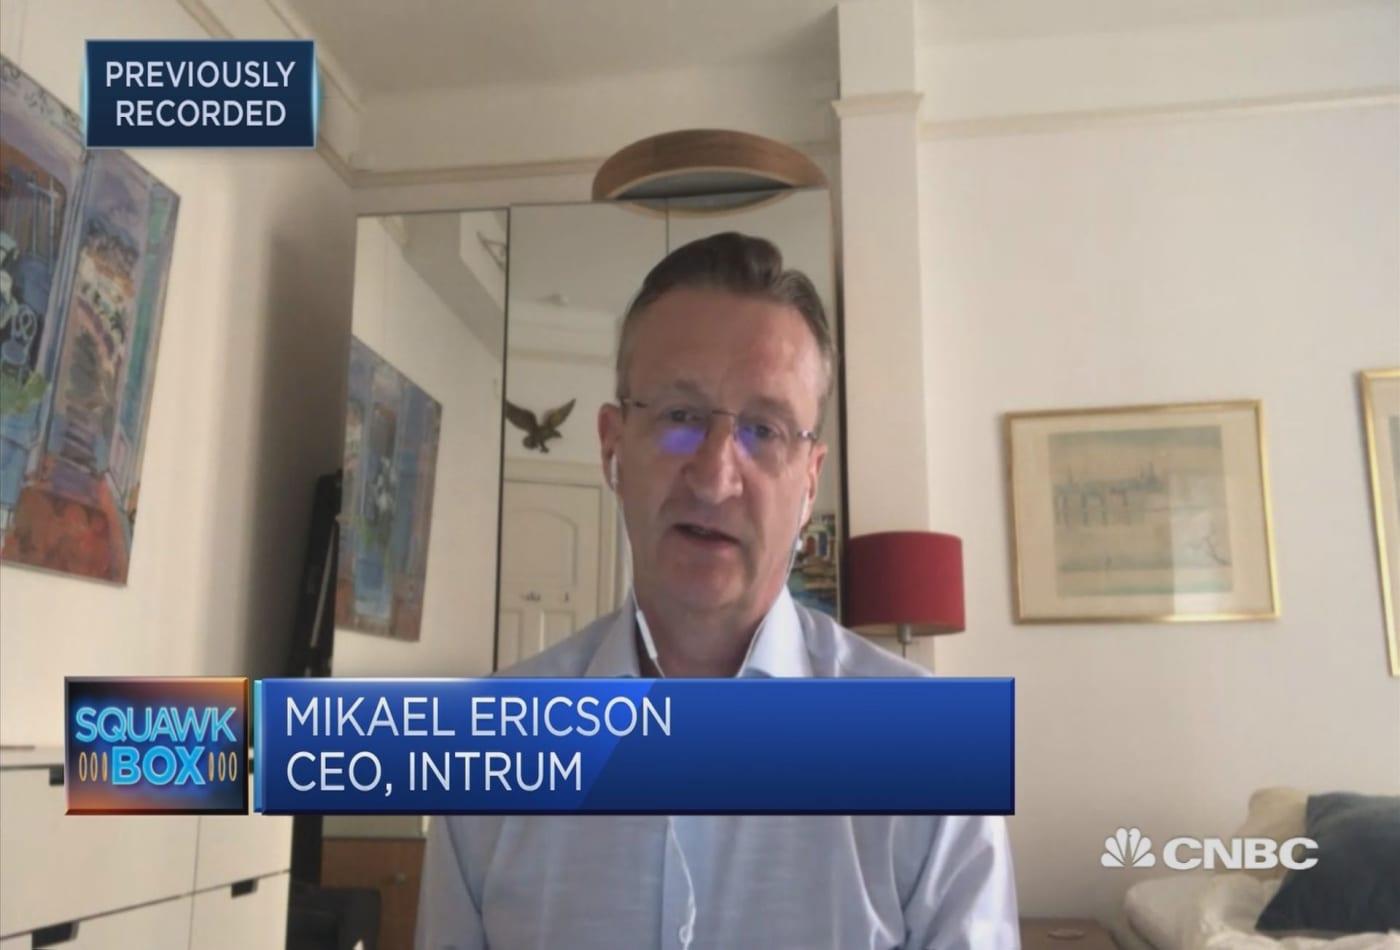 Companies around Europe preparing for a recession, Intrum CEO says